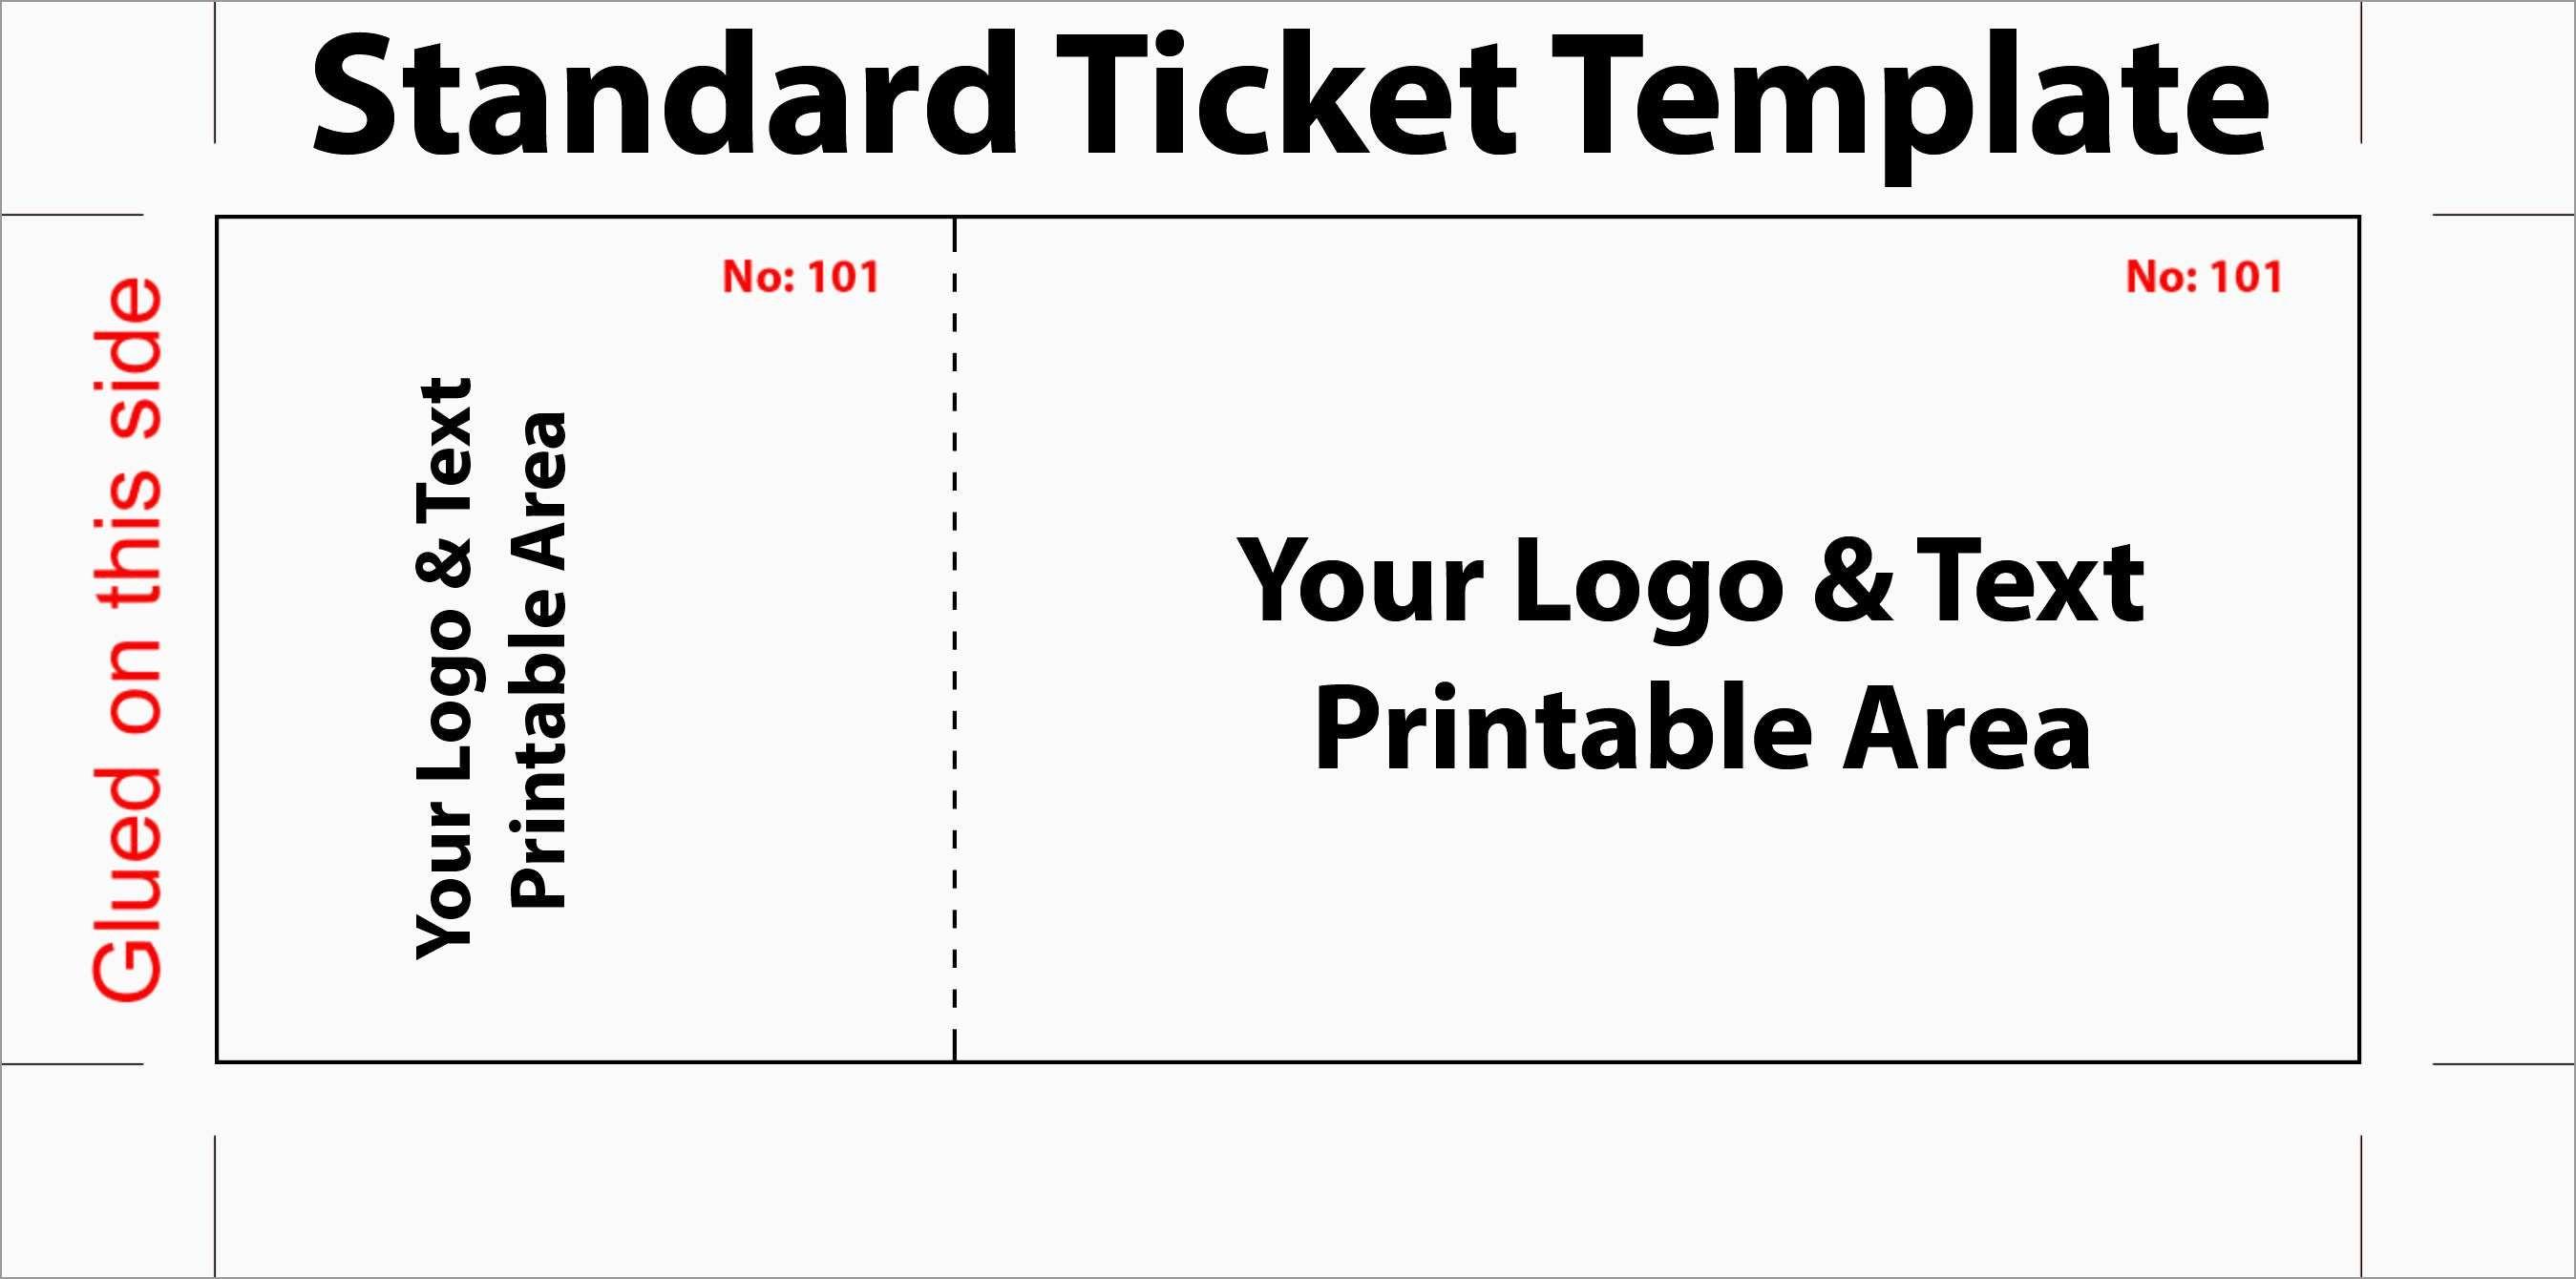 New Free Printable Raffle Ticket Template Download | Best Of Template - Free Printable Raffle Ticket Template Download